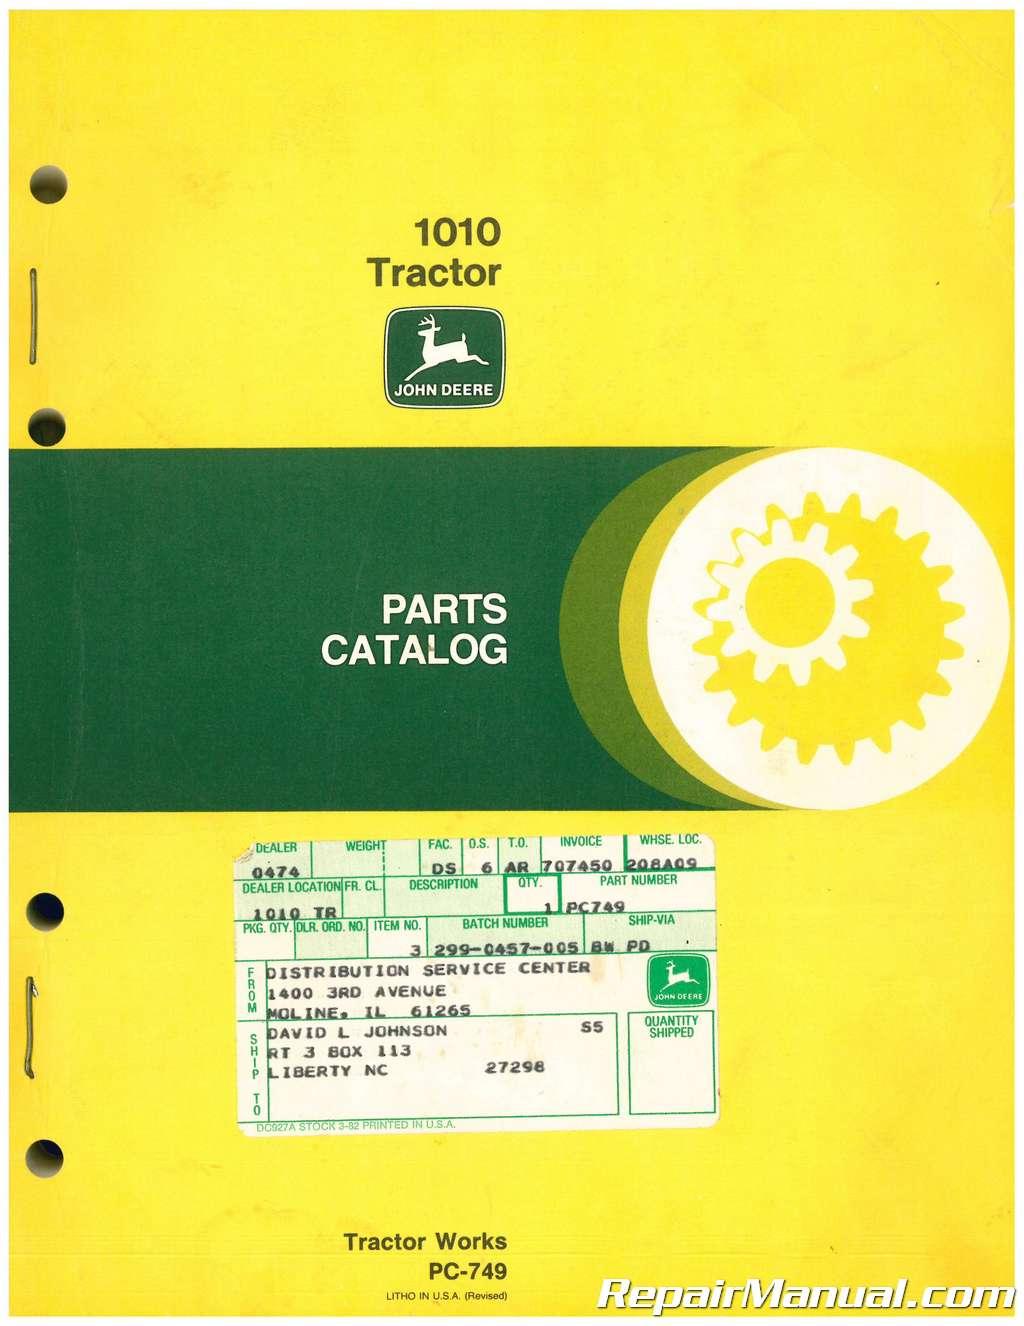 John Deere Parts Catalog >> Used John Deere 1010 Tractor Parts Catalog